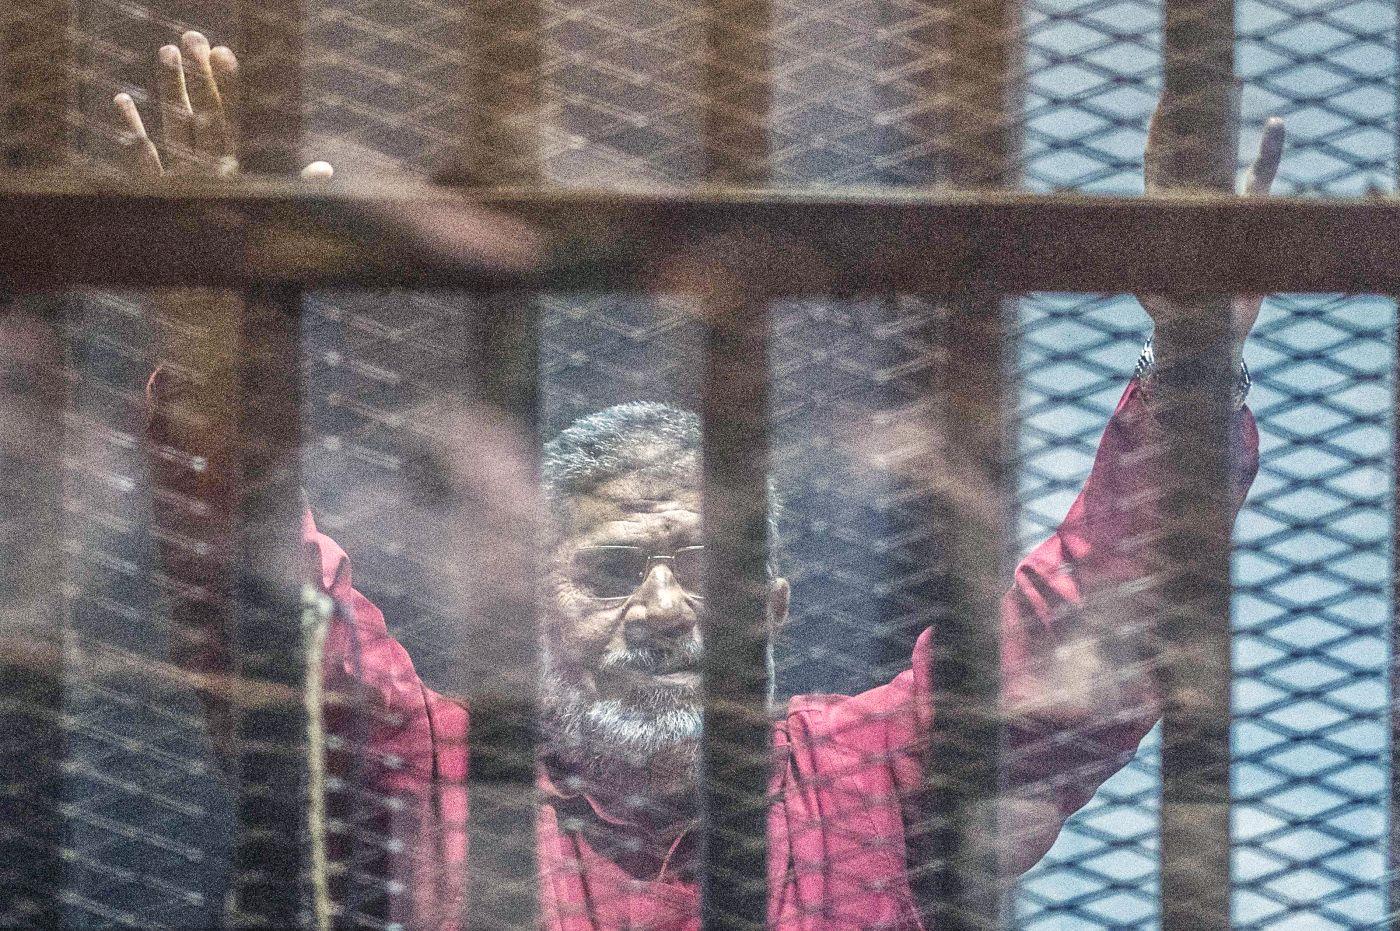 Murió el expresidente egipcio Mohamed Mursi